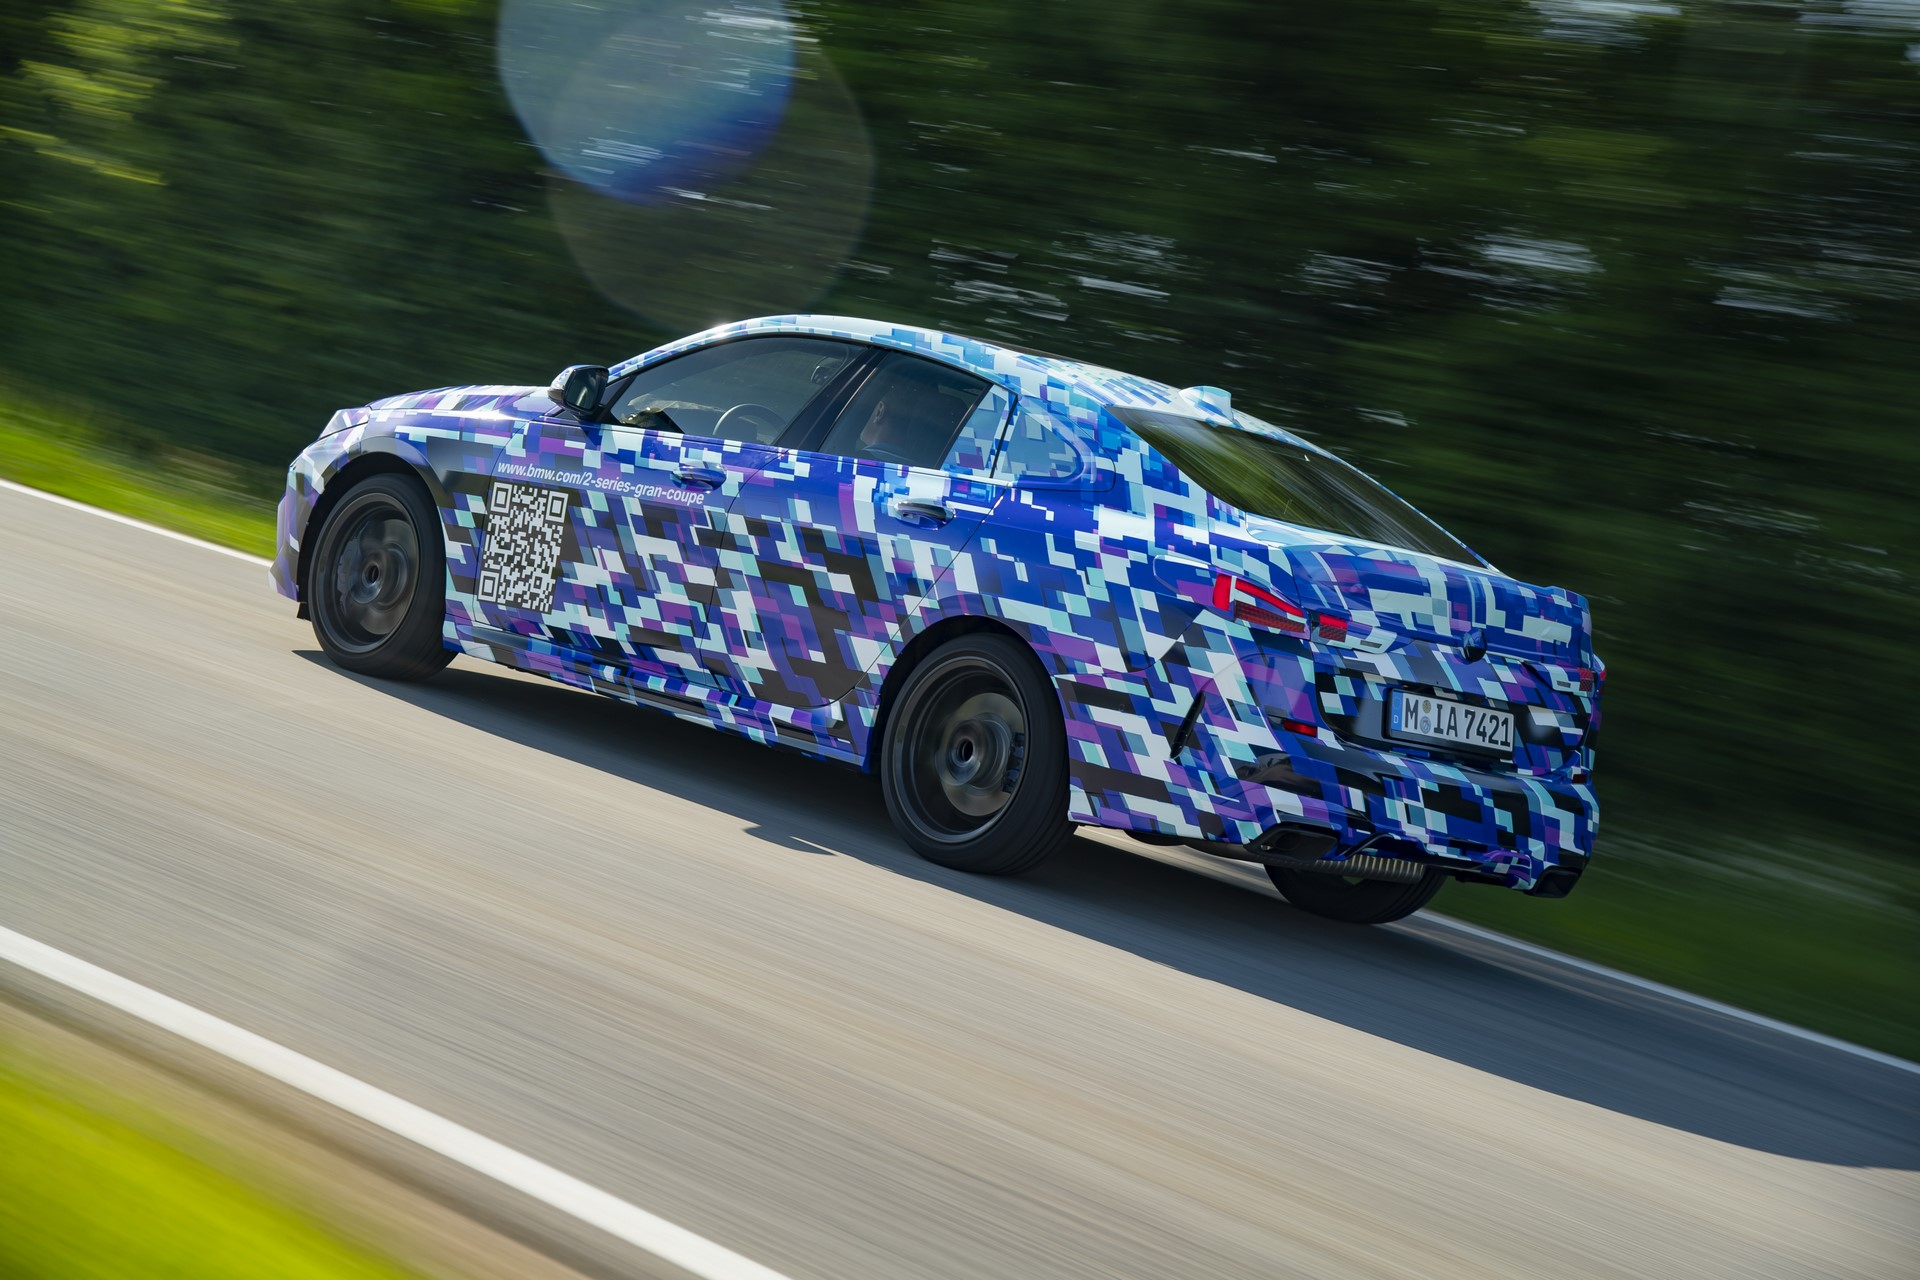 BMW-2-Series-Gran-Coupe-2020-spy-photos-32